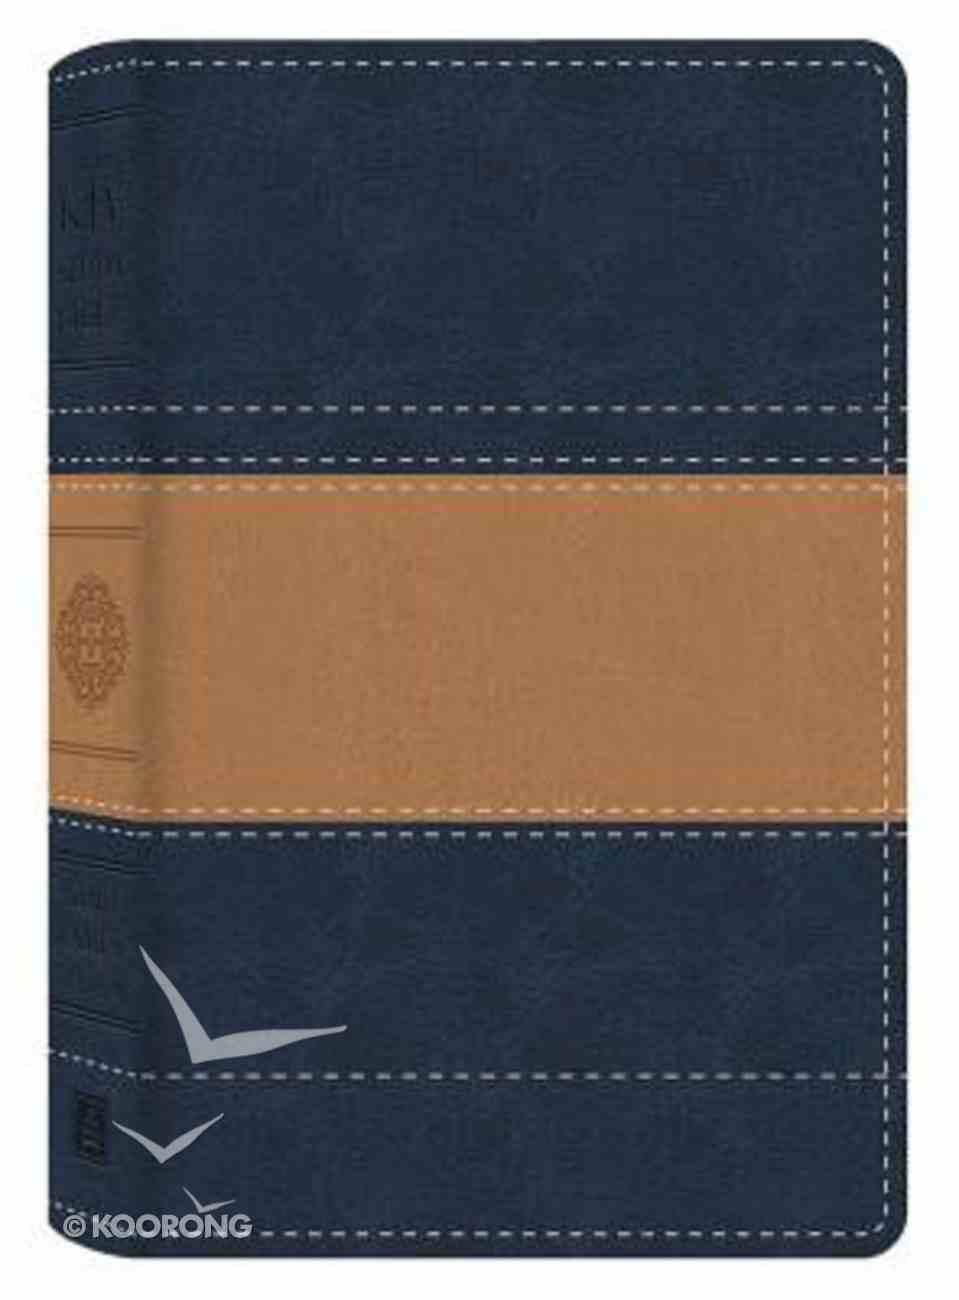 KJV Study Bible Illustrated Edition Blue/Tan Flexi Back